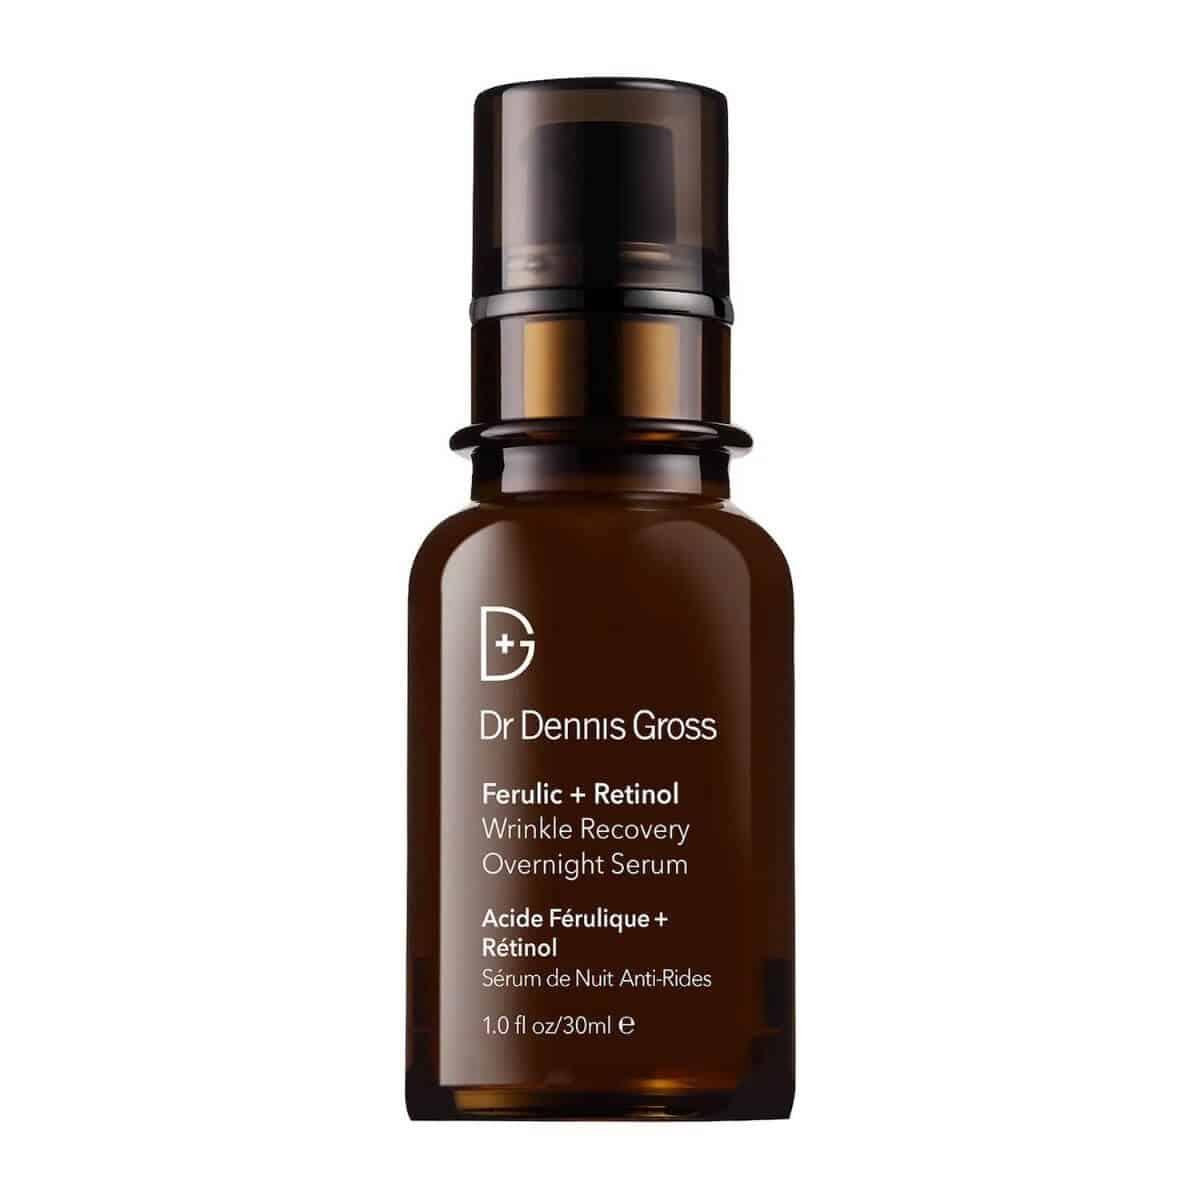 Amber bottle of retinol serum by Dr. Dennis Gross.